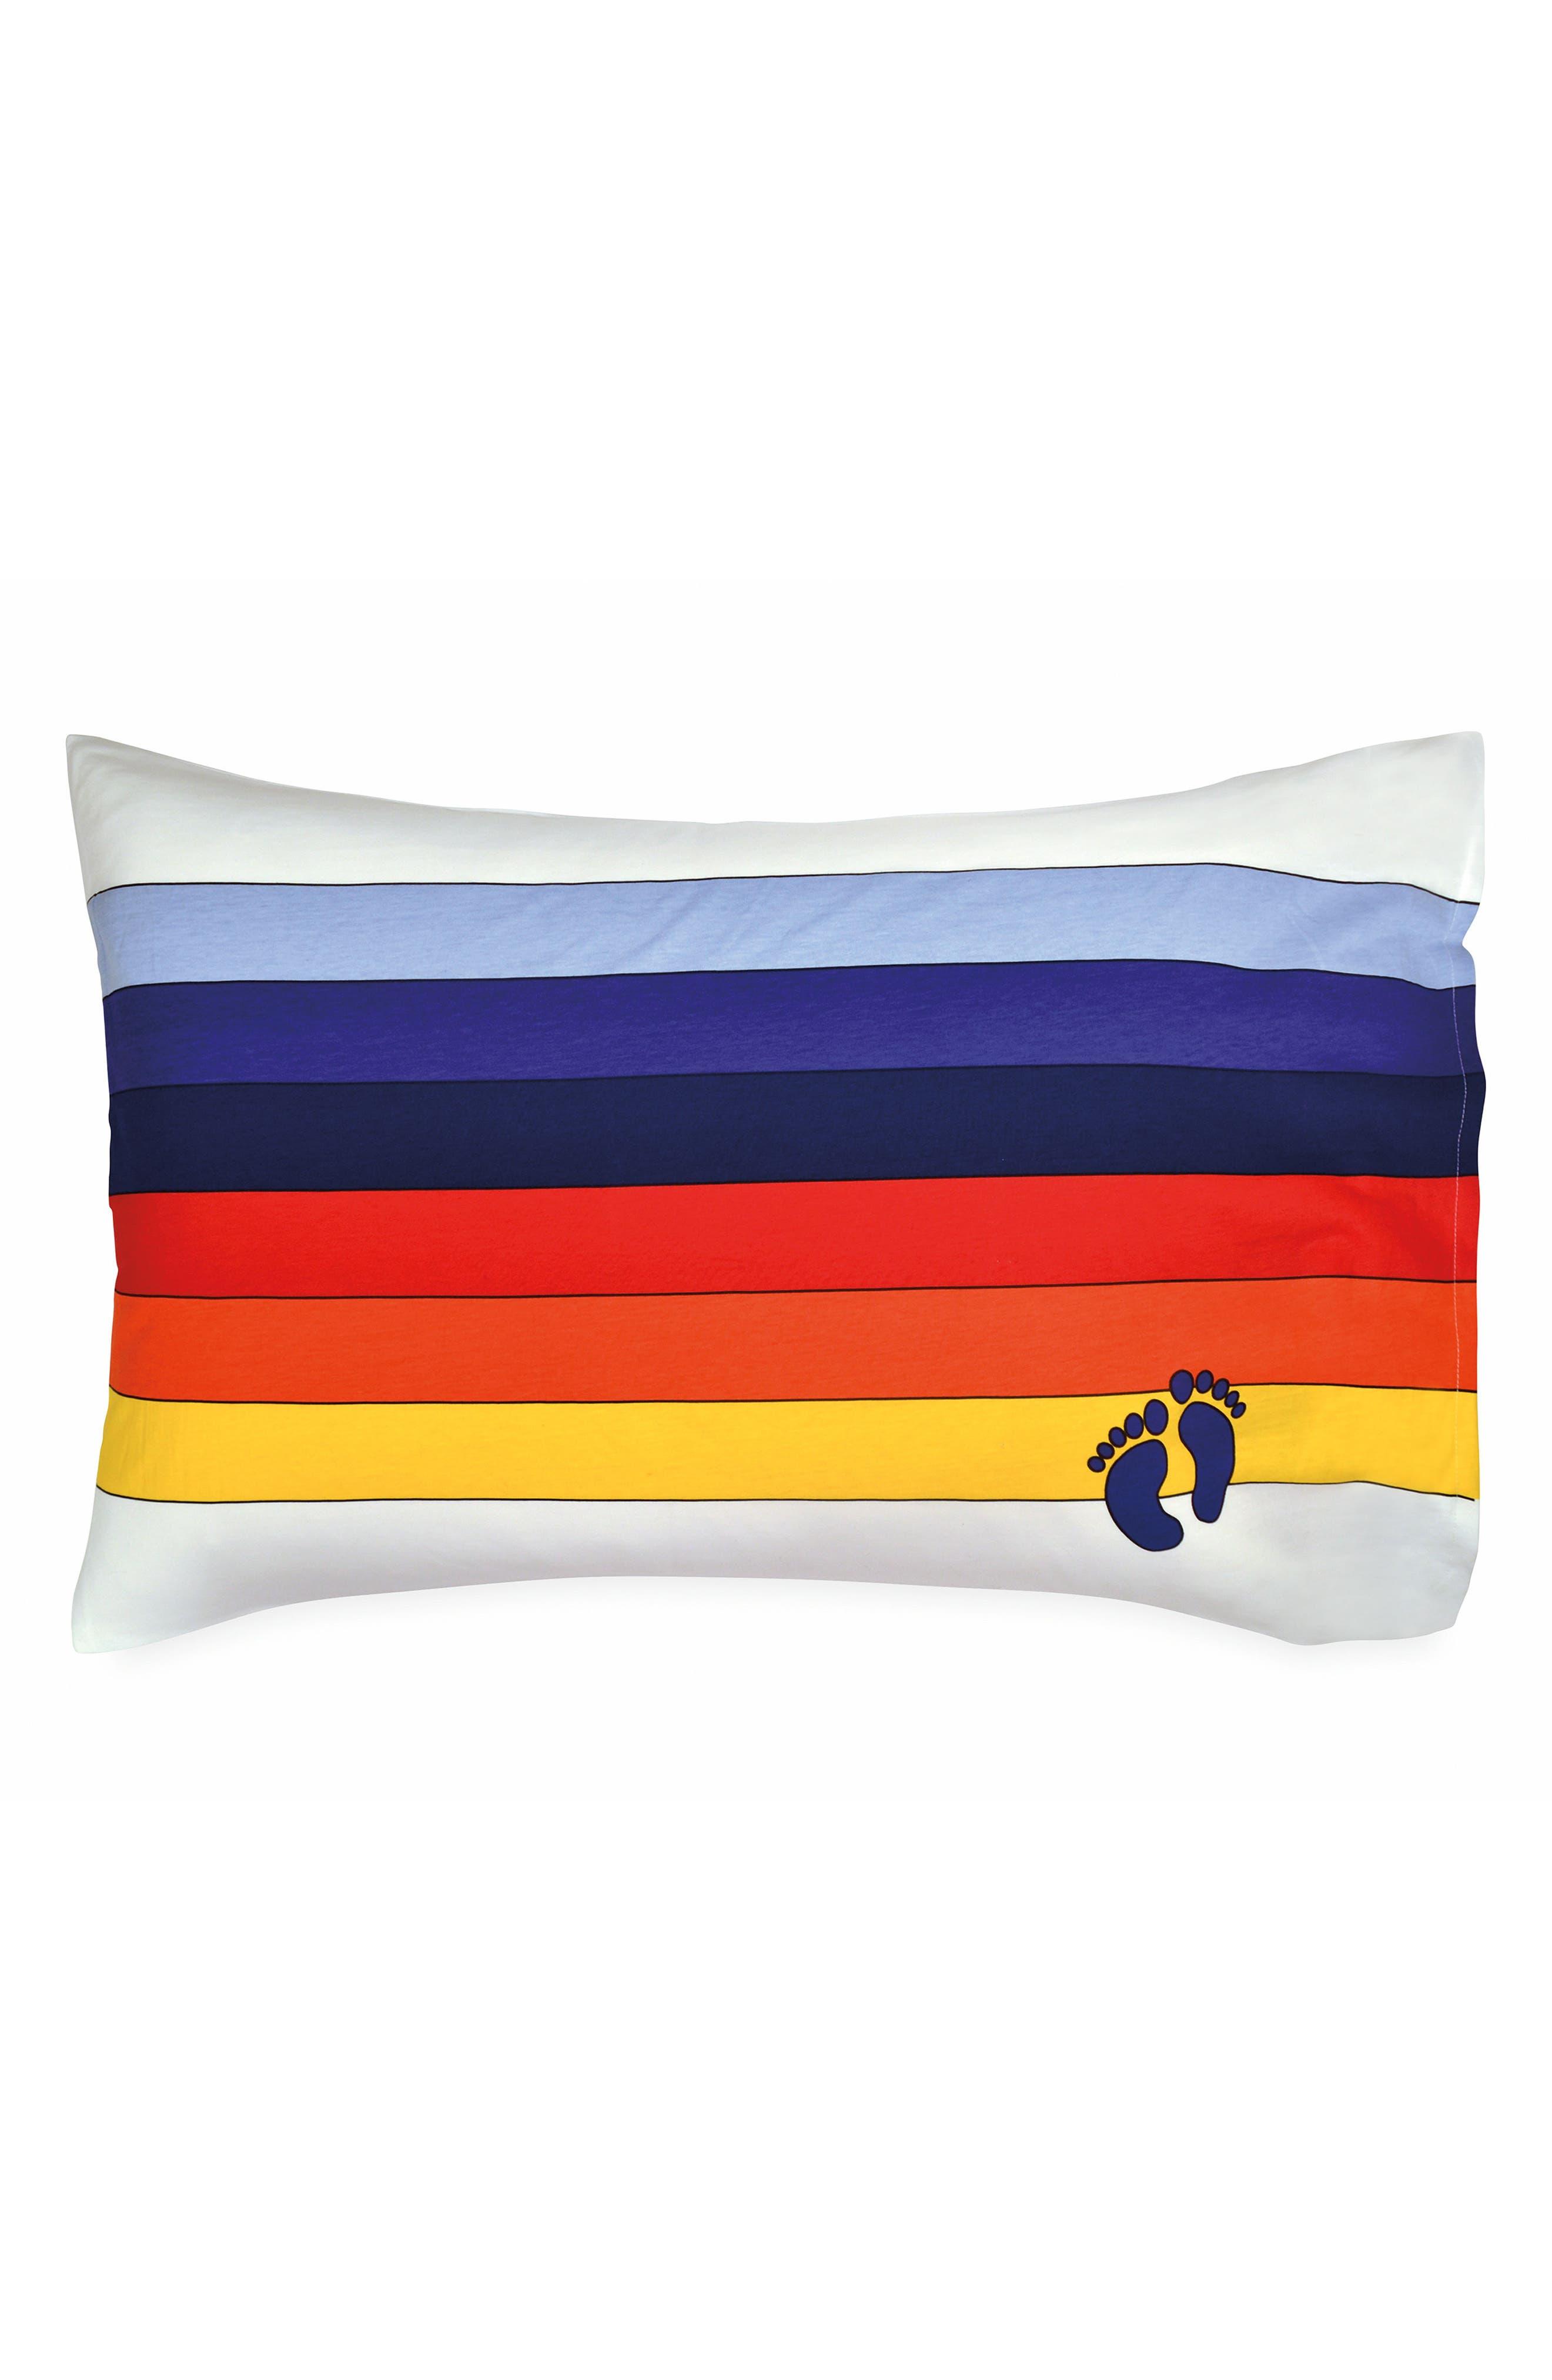 Rainbow Pillowcase,                             Main thumbnail 1, color,                             100